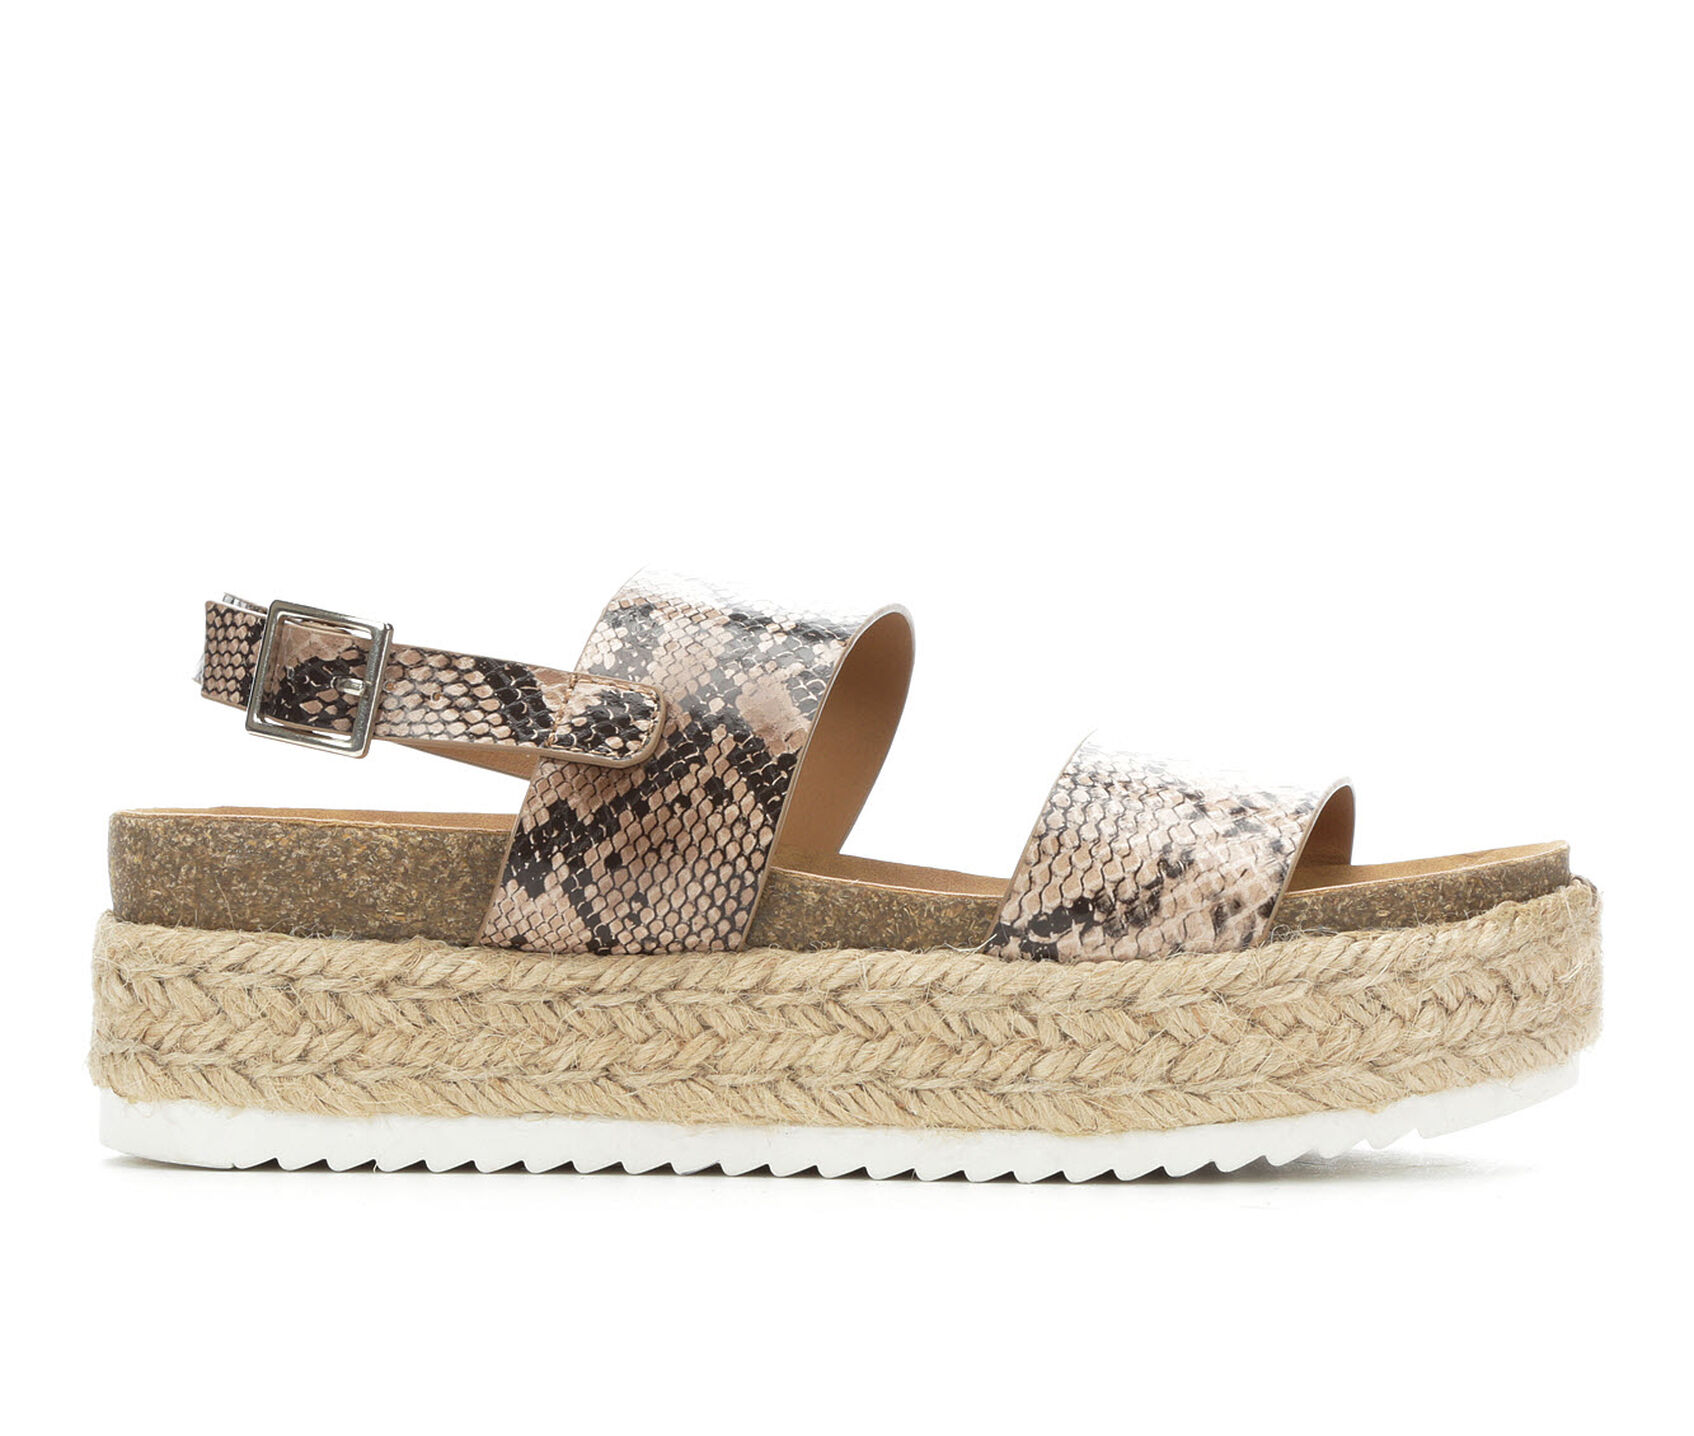 bd3cfbeda0368 Women's Soda Kazoo Flatform Sandals